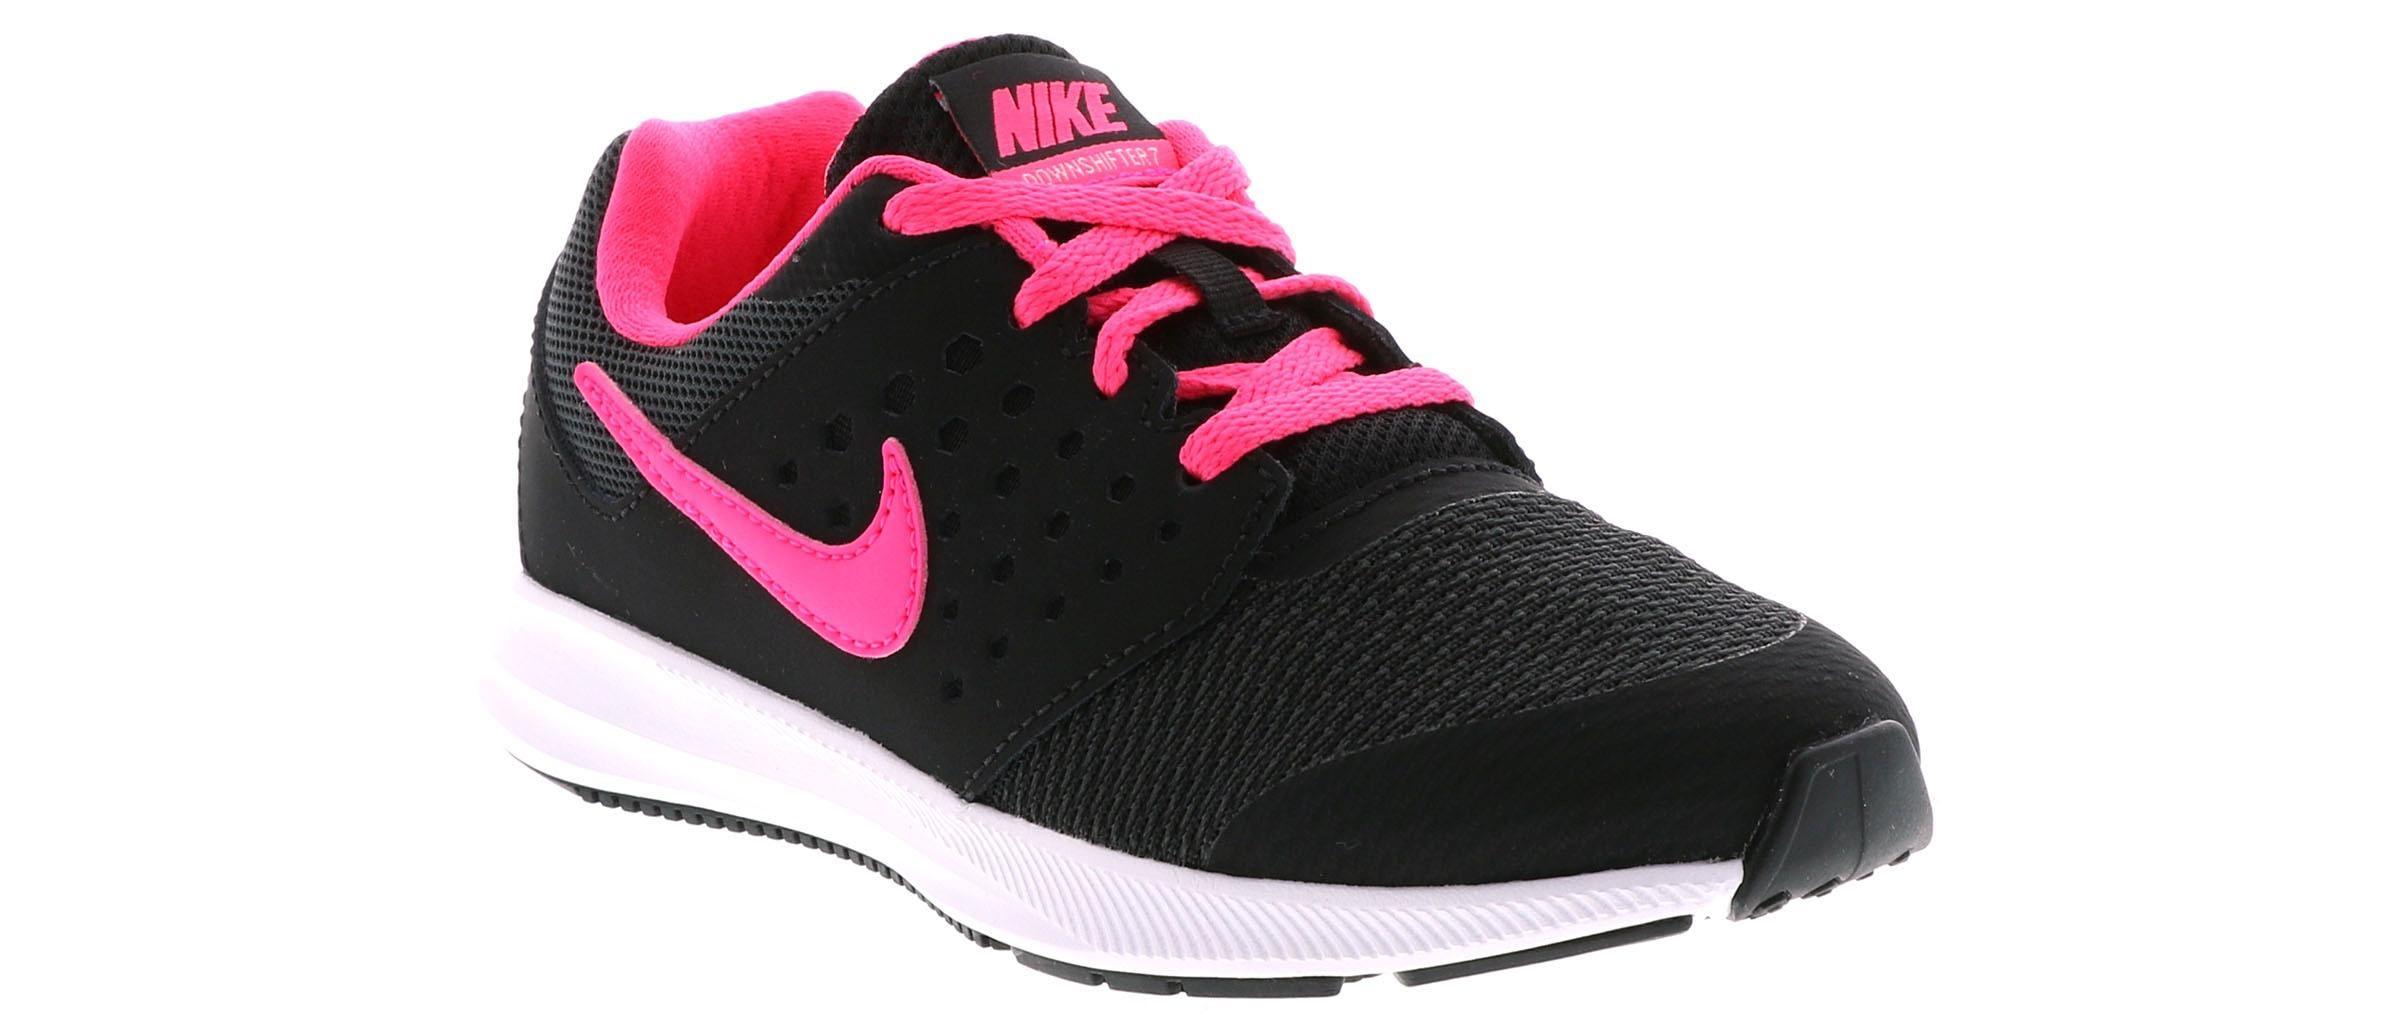 quality design 667ba fc679 NIKE Kid's Nike Downshifter 7 (11-3) Running Shoes|Shoe ...